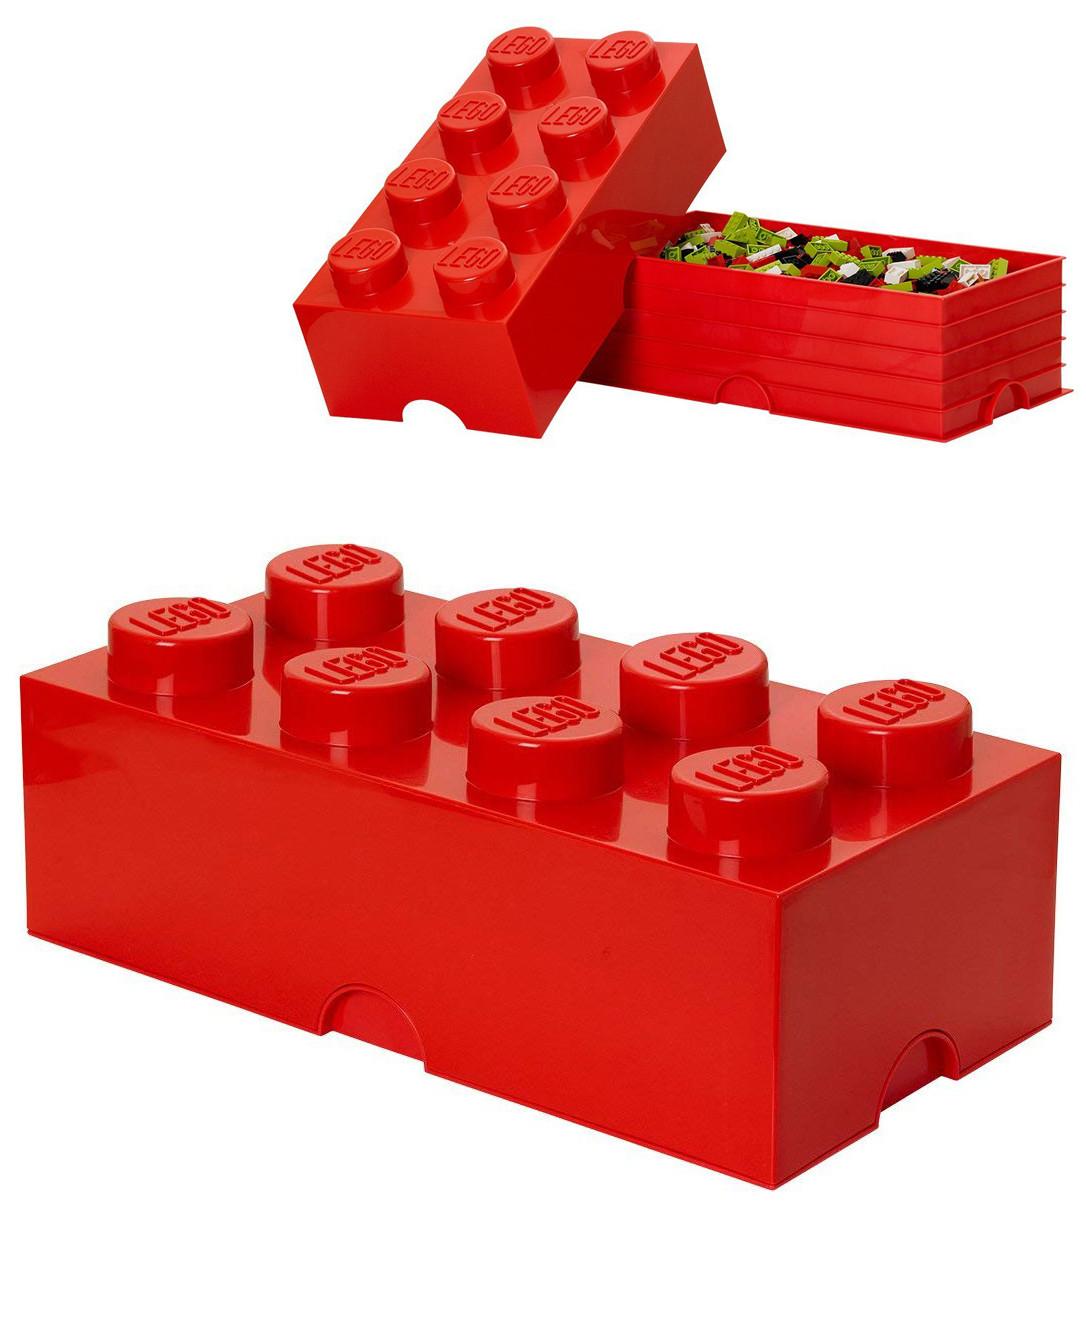 de rangement lego grand modele 8 plots